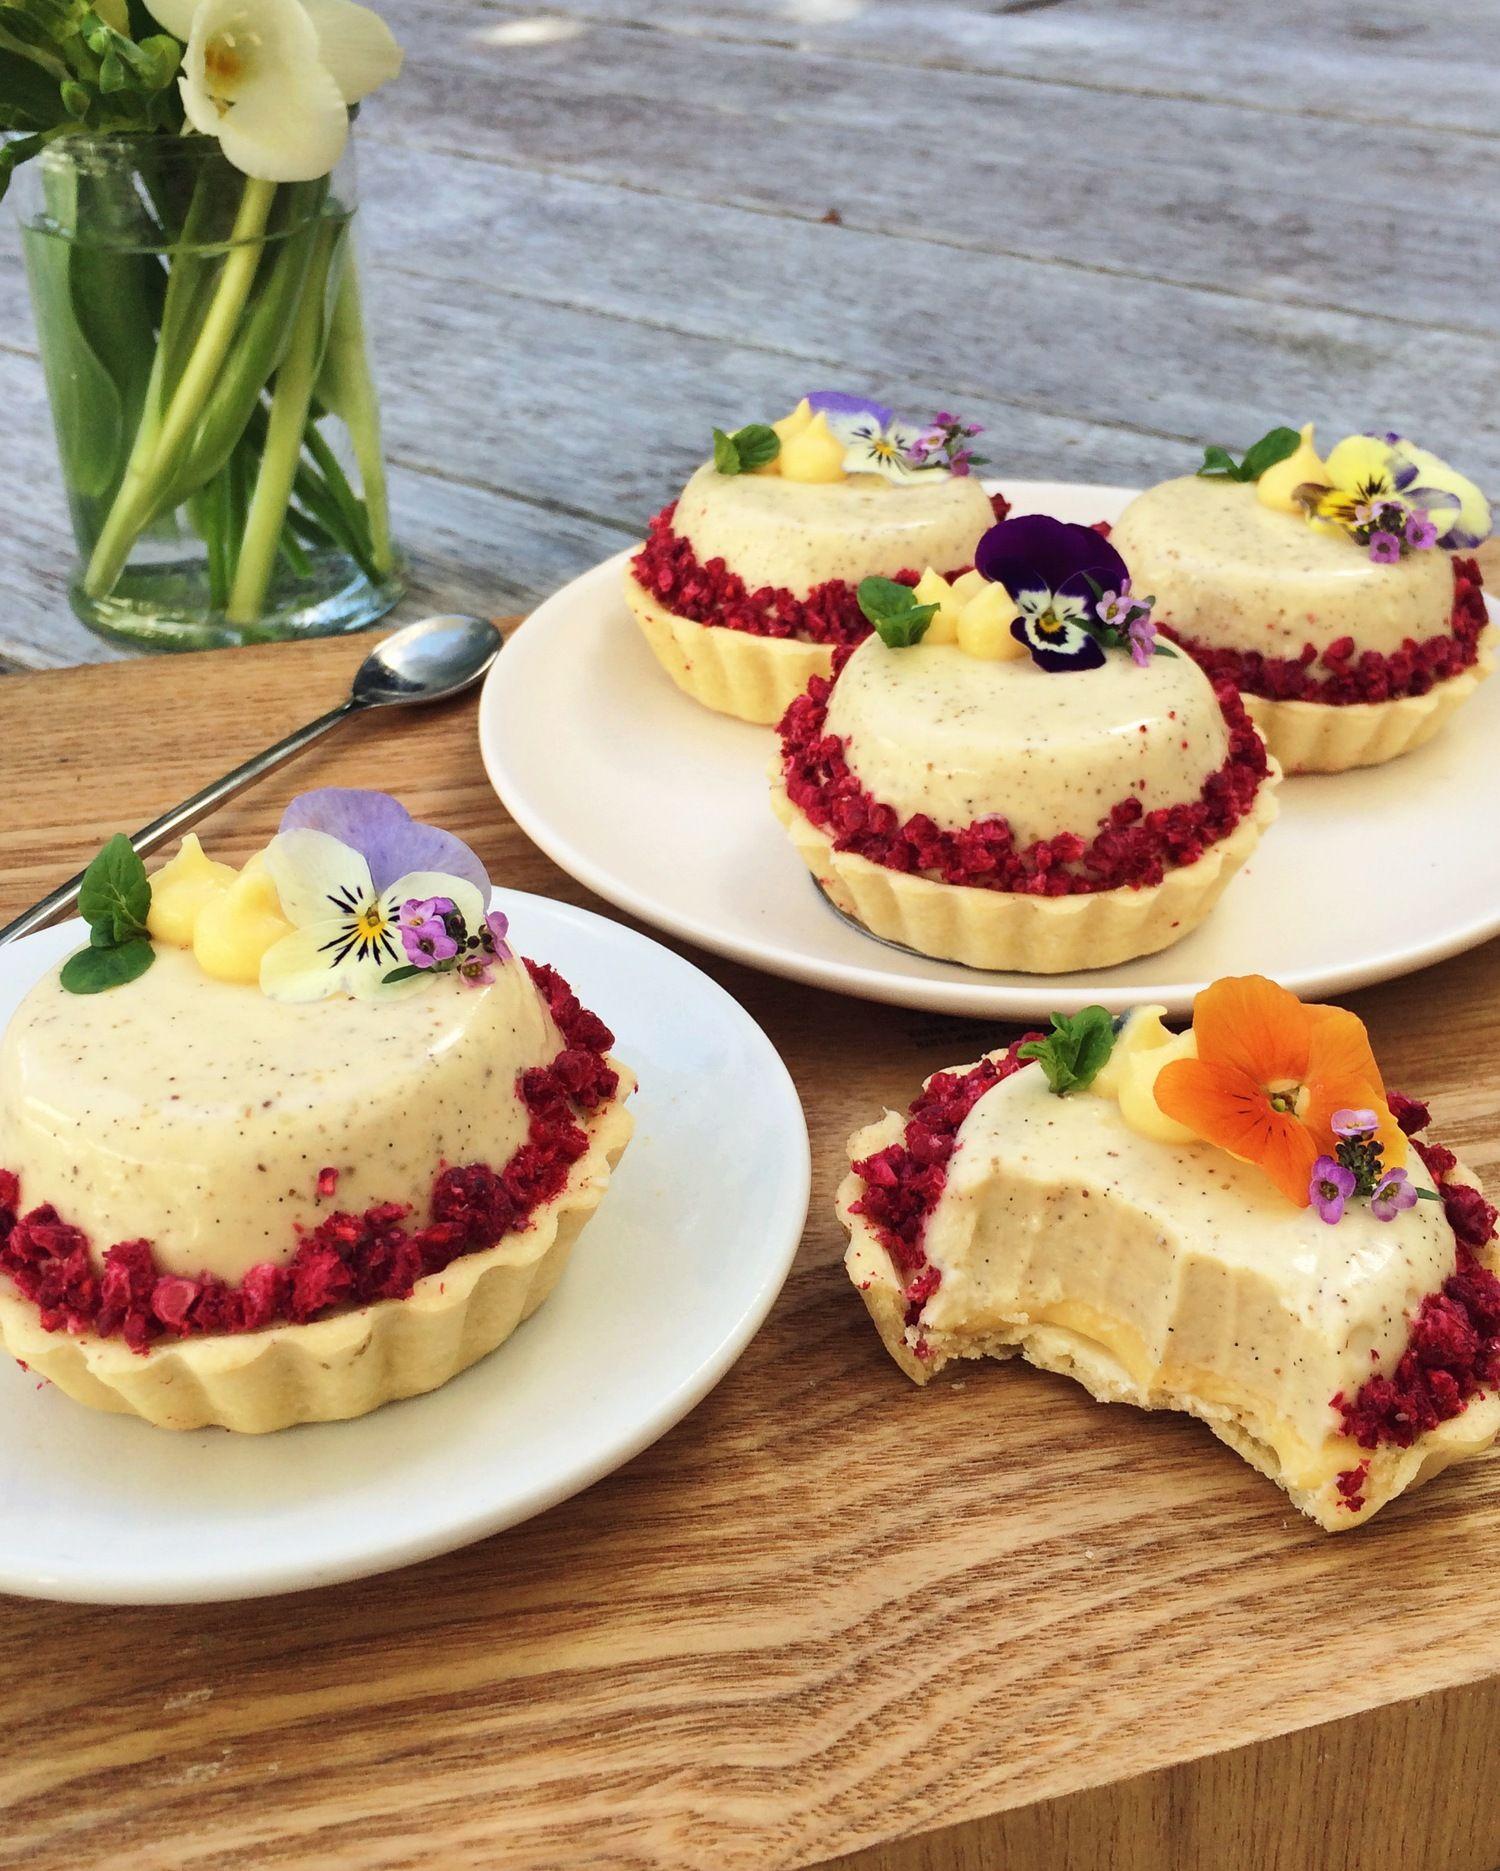 Pin by Deborah Brown on Cakes and Cupcakes Sweet tarts